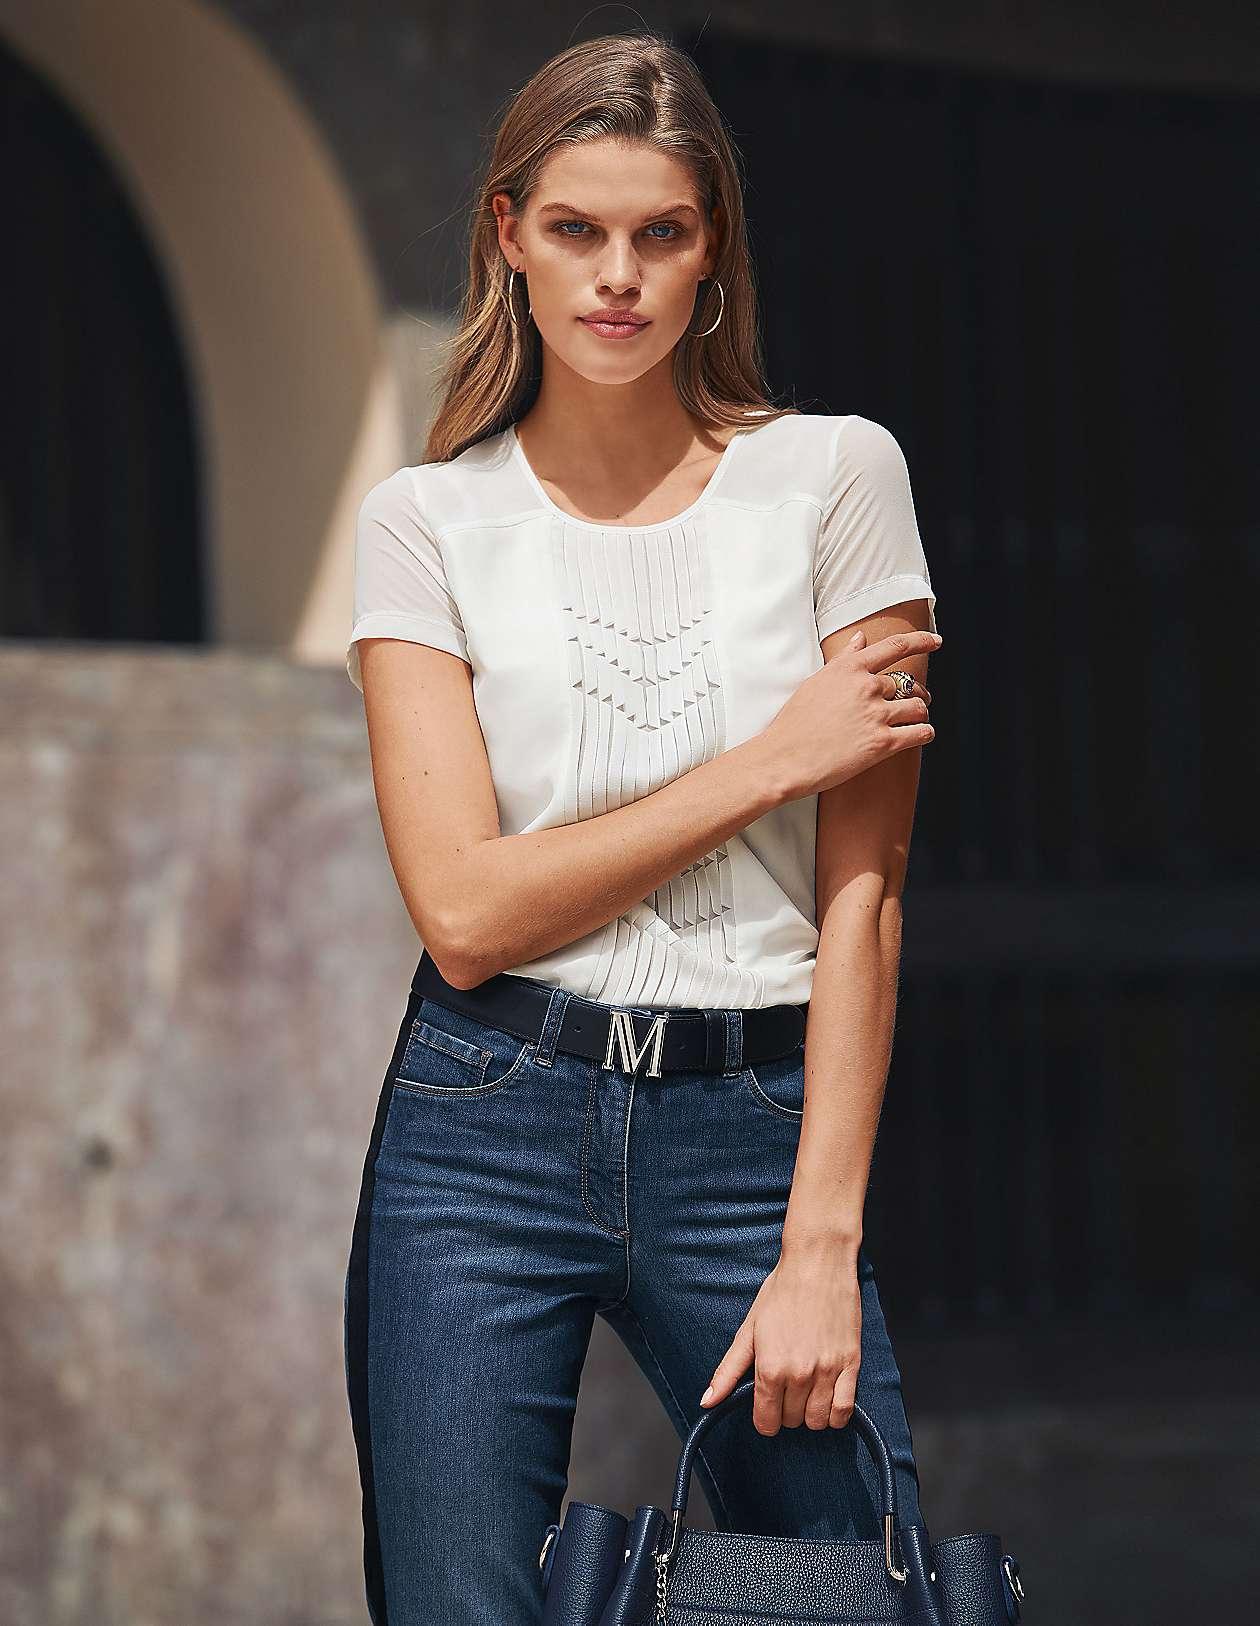 e4631343510fb4 Damen-Shirts und Tops- exklusiv, edel, extravagant, elegant ...